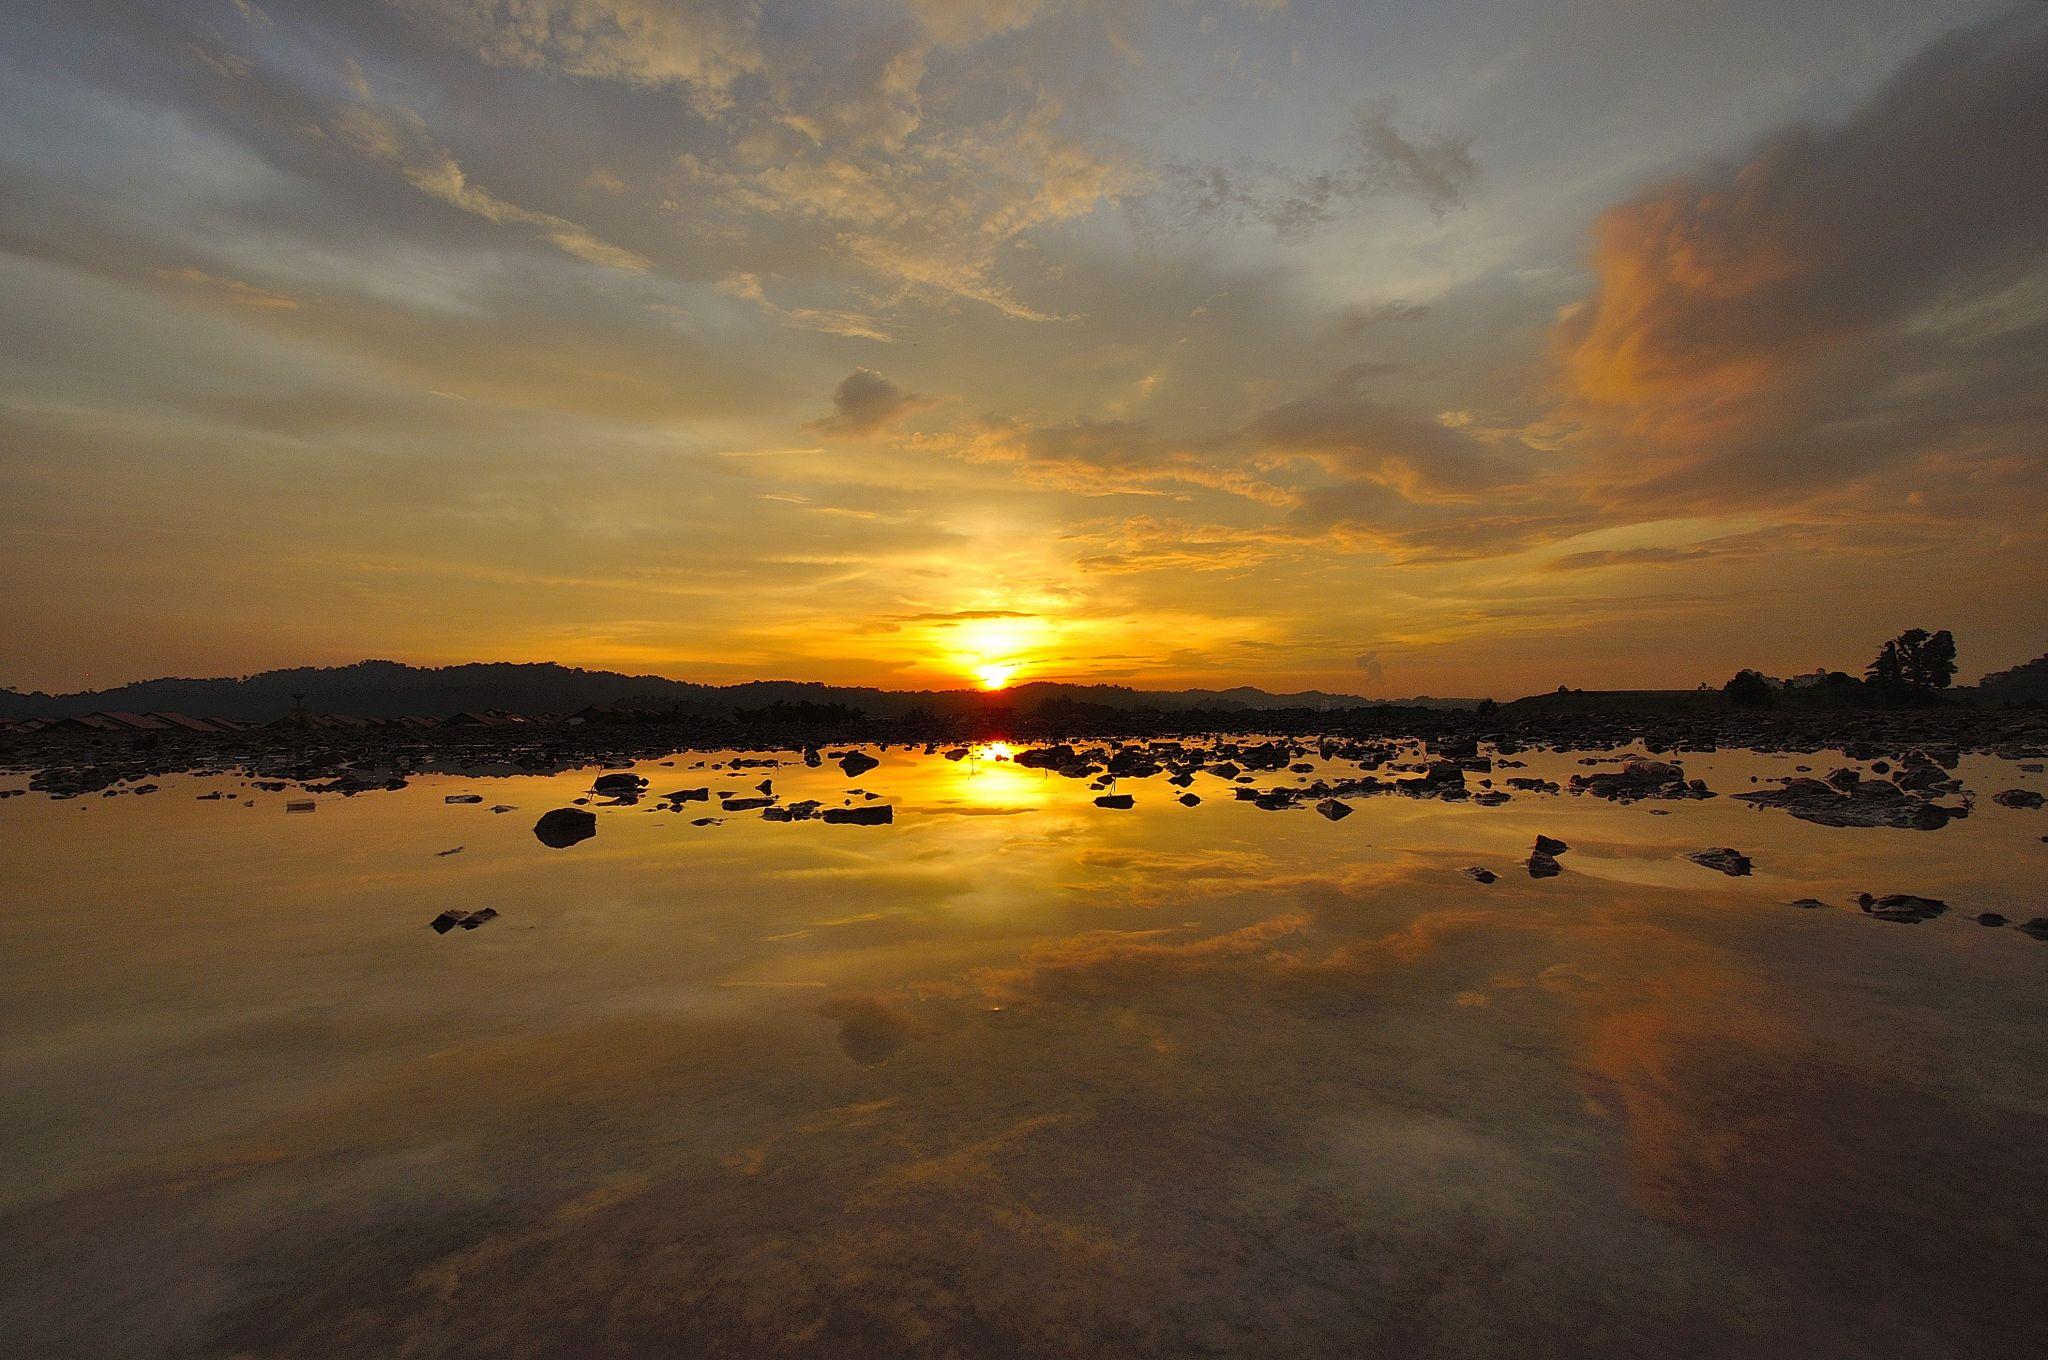 Lake of Puchong, Selangor, Malaysia